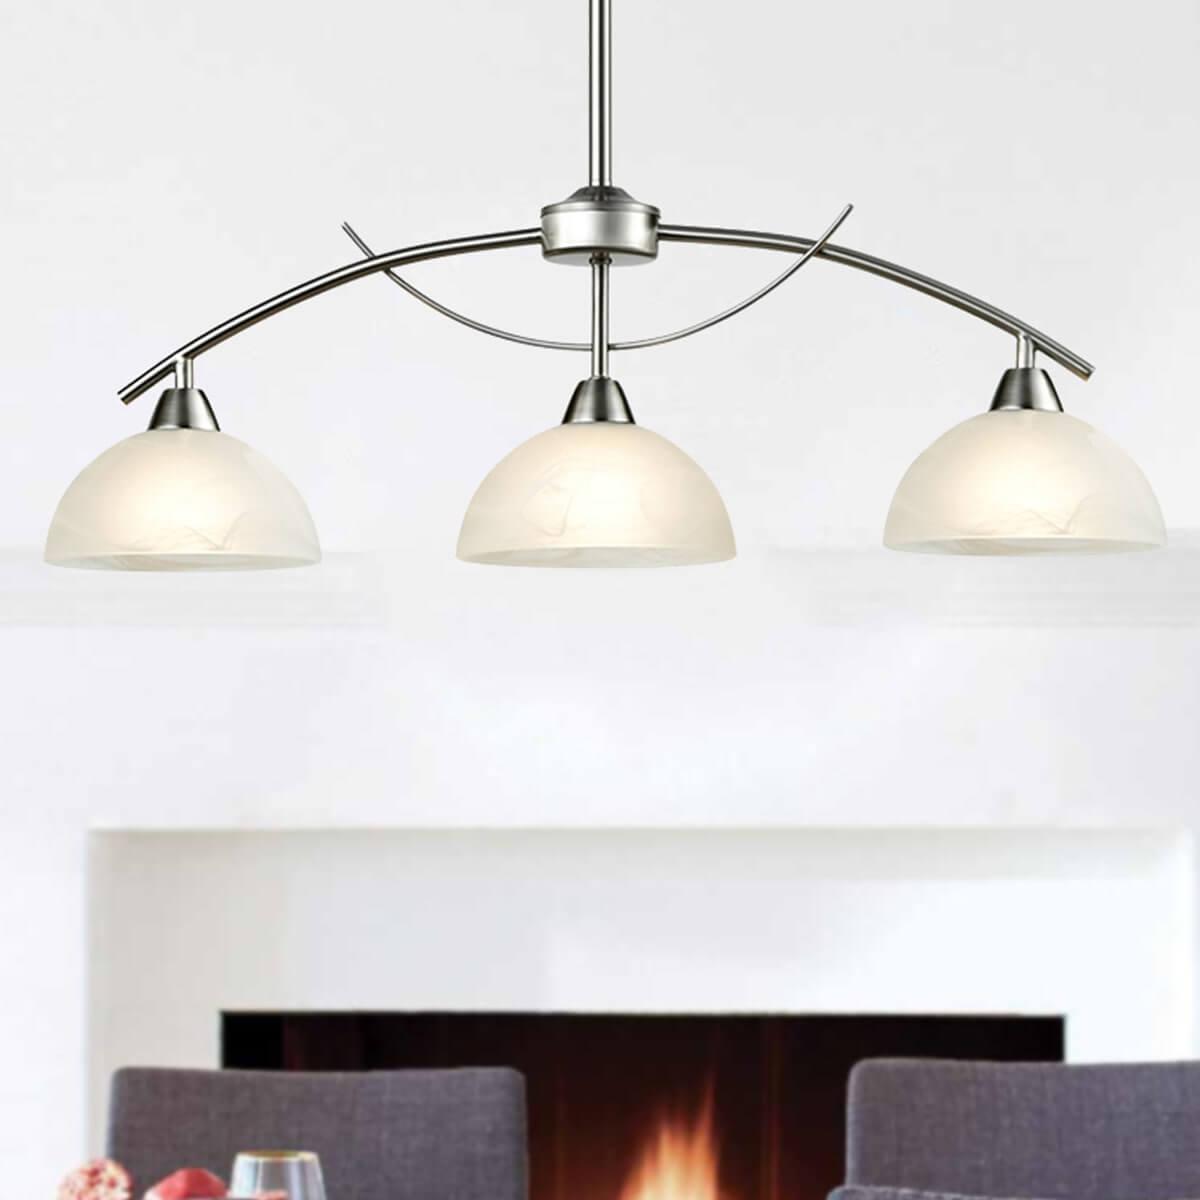 Modern Arched 3-Light Kitchen Pendant Lighting, Brushed Nickel